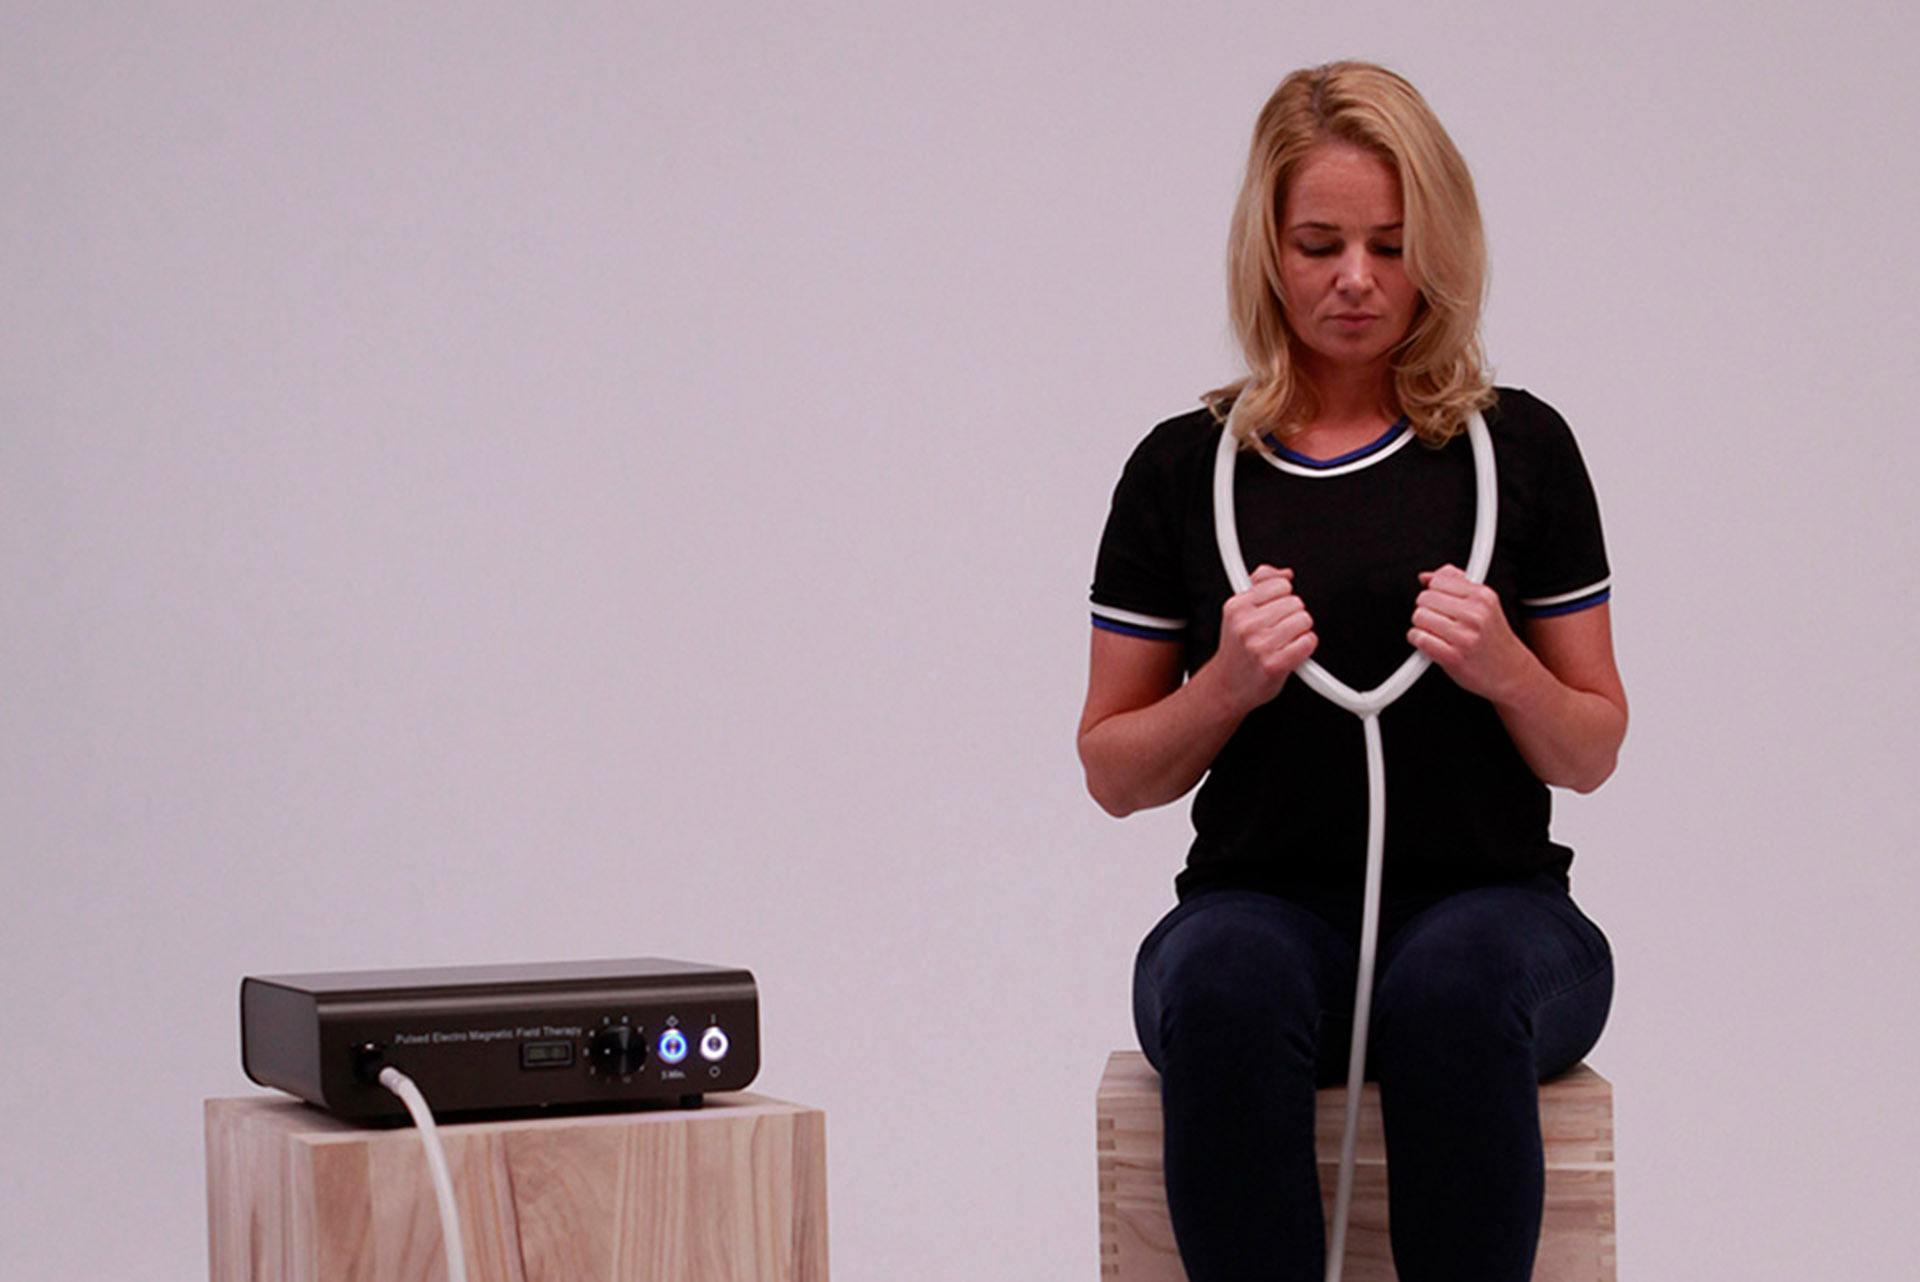 PEMF neck application TeslaFit PEMF therapy system